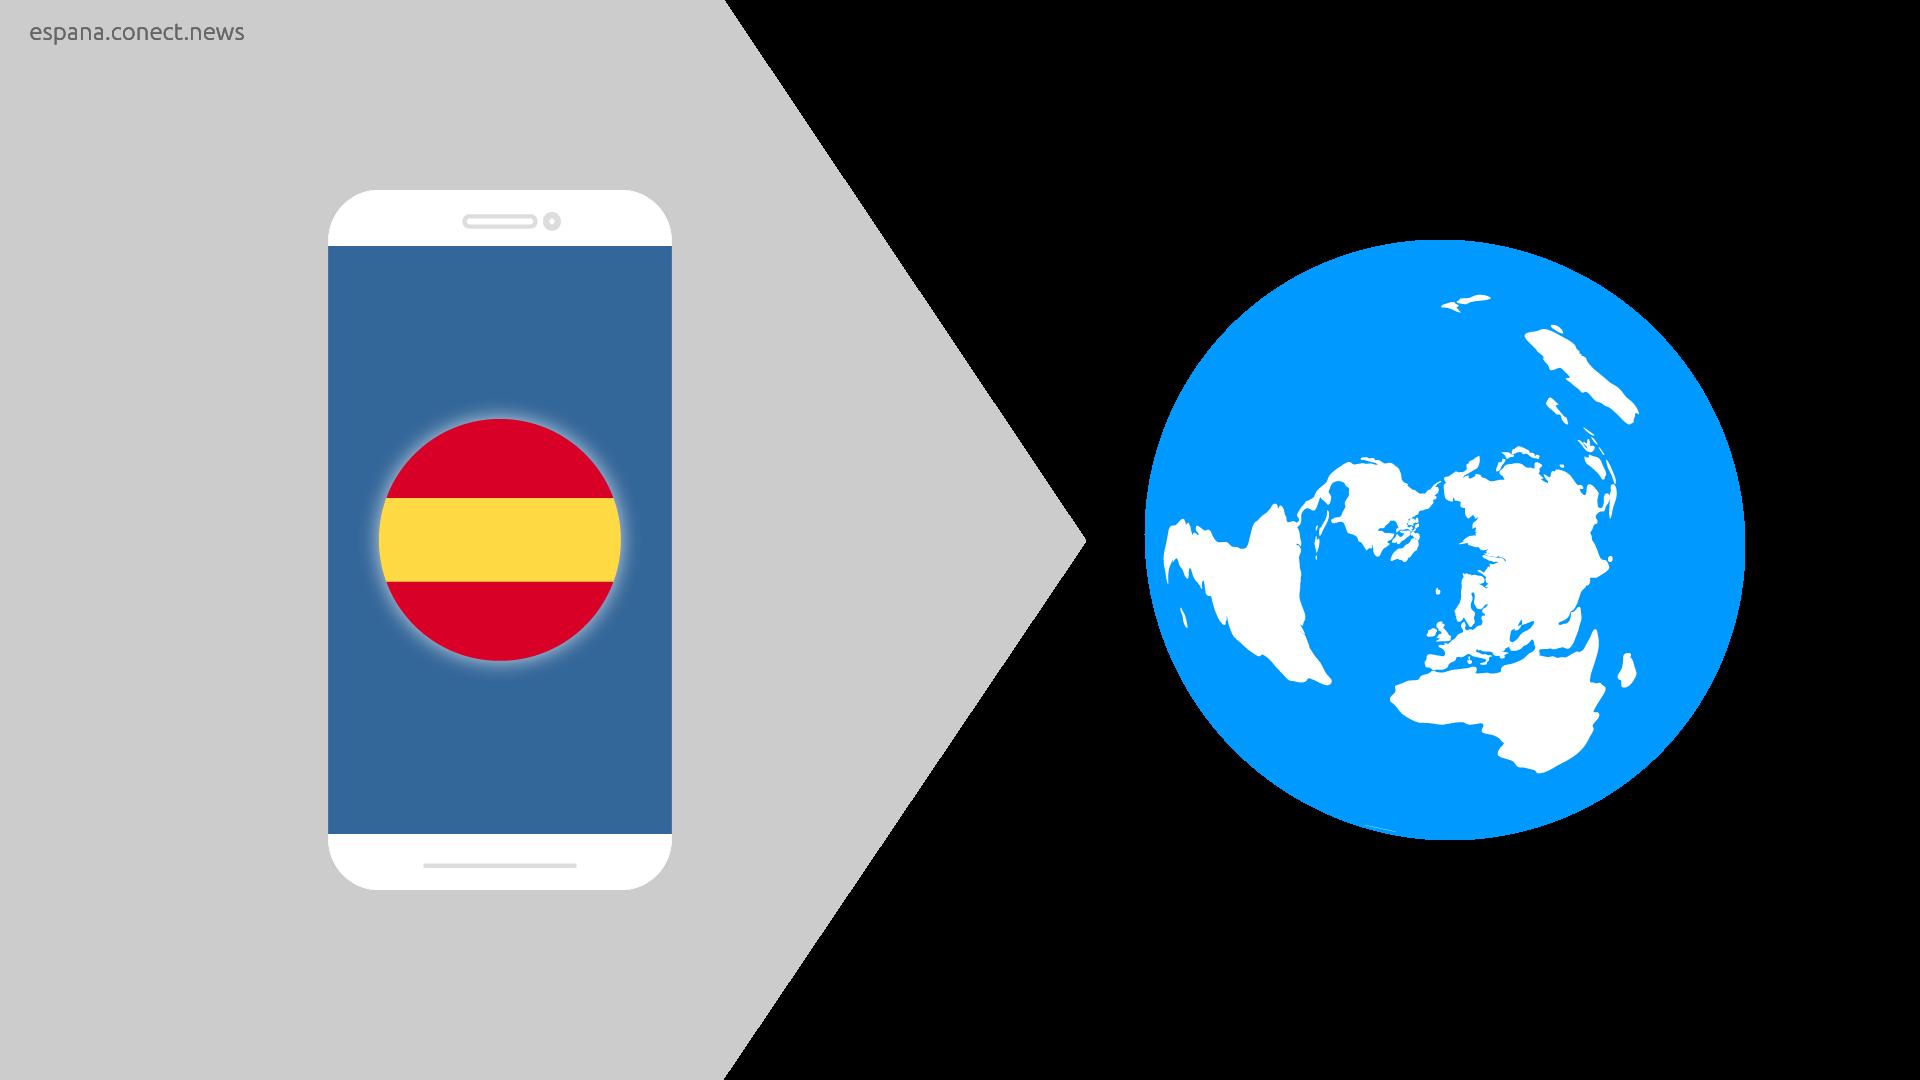 Spanien-international@conect_news